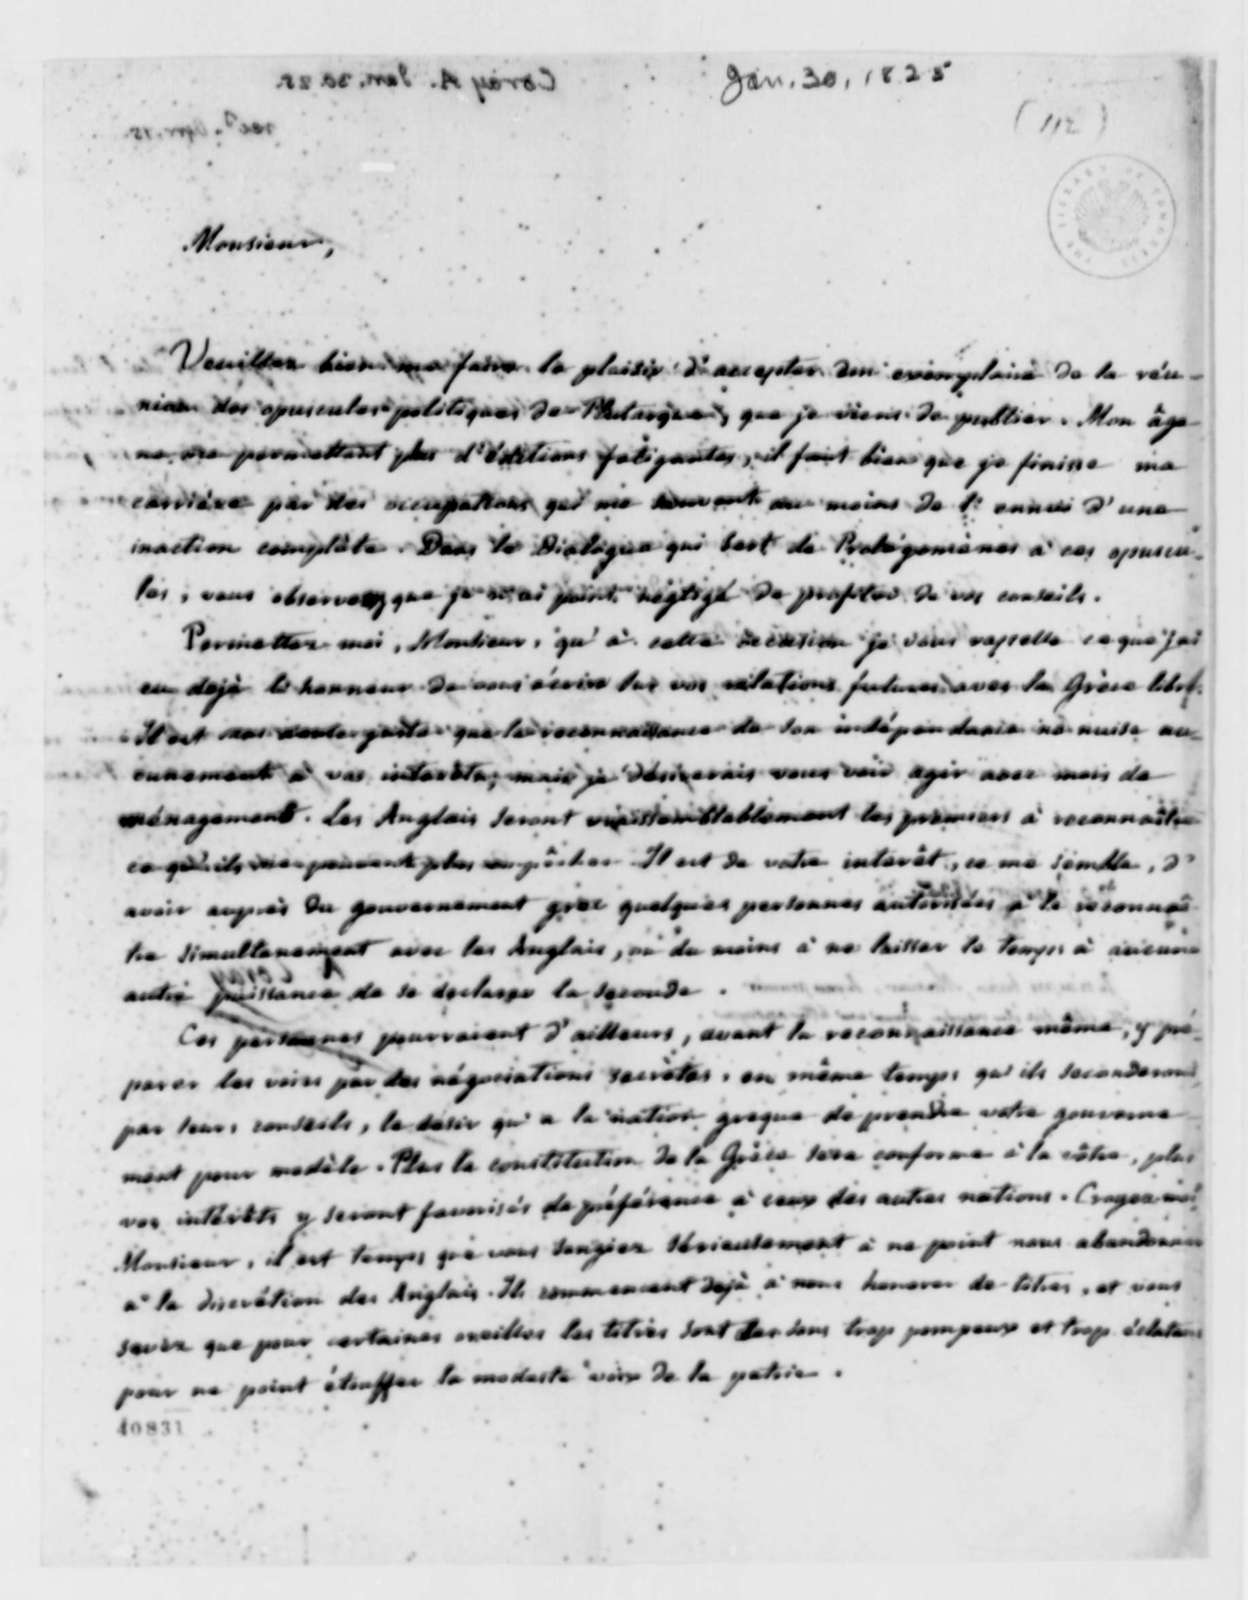 Thomas Jefferson to Adamantios Coray, January 30, 1825, in French